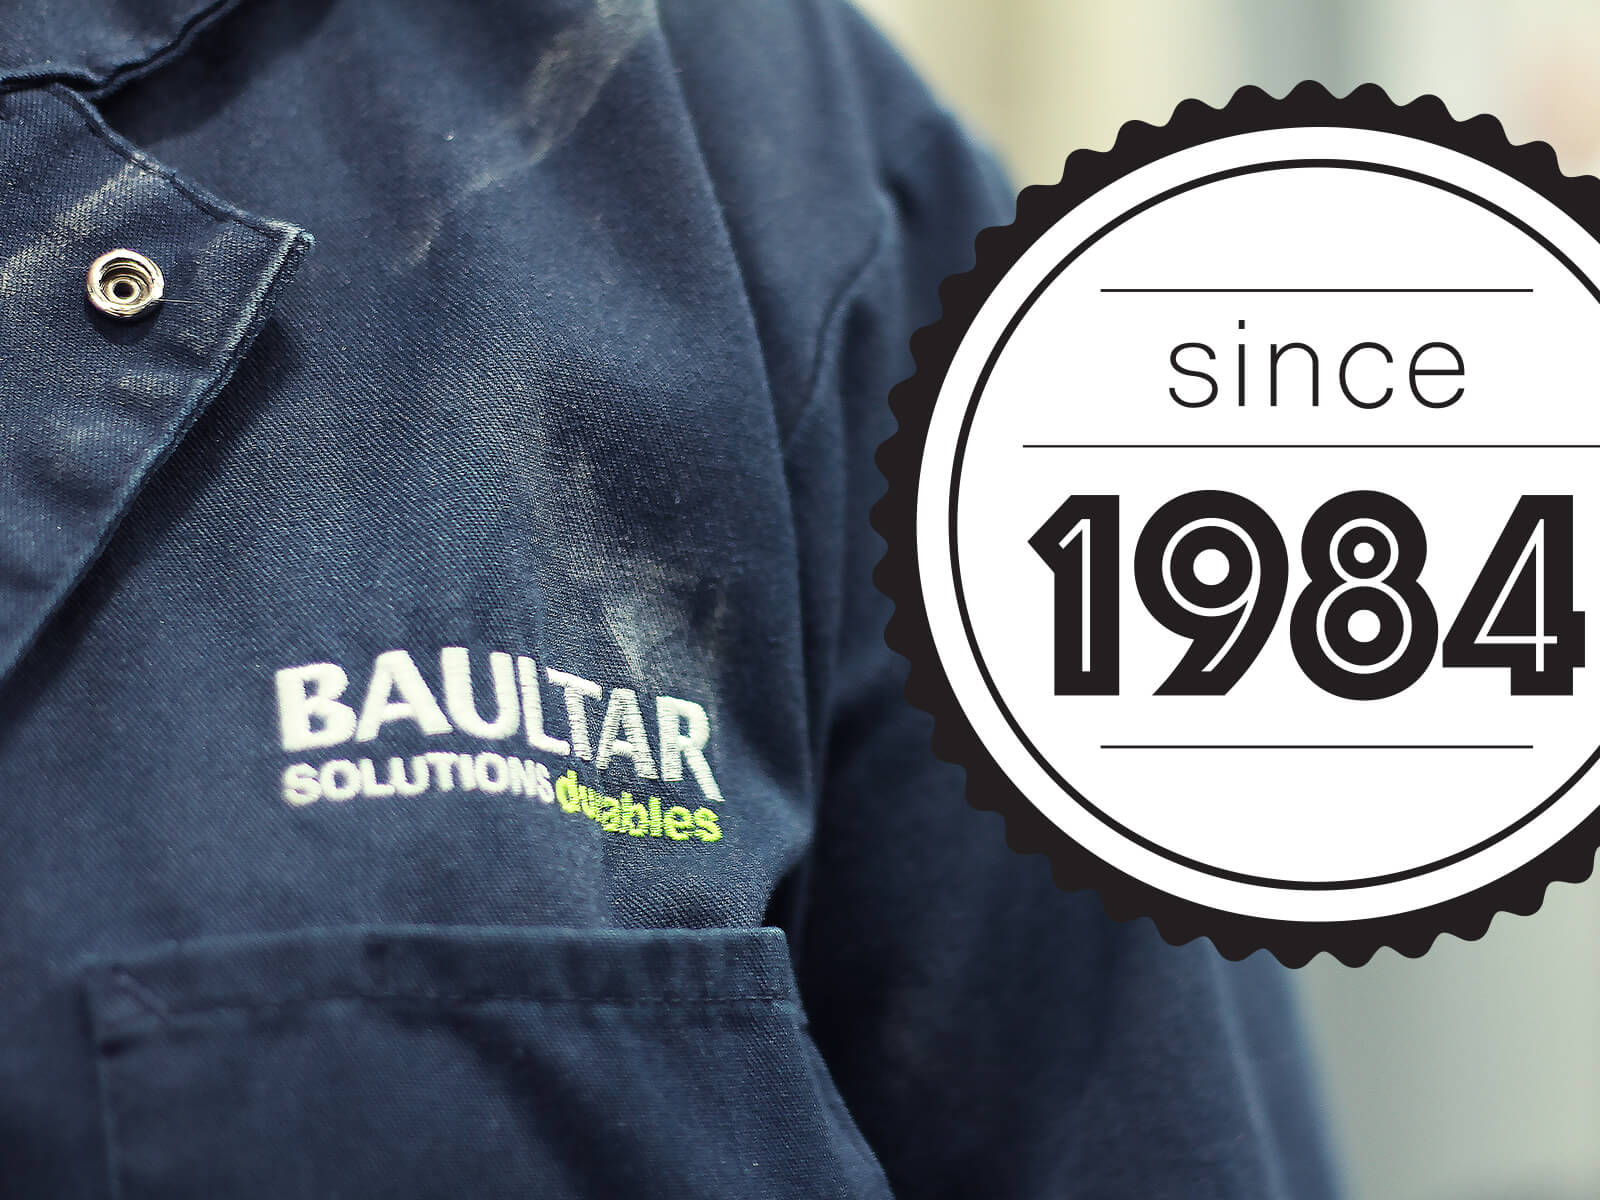 Baultar Since 1984